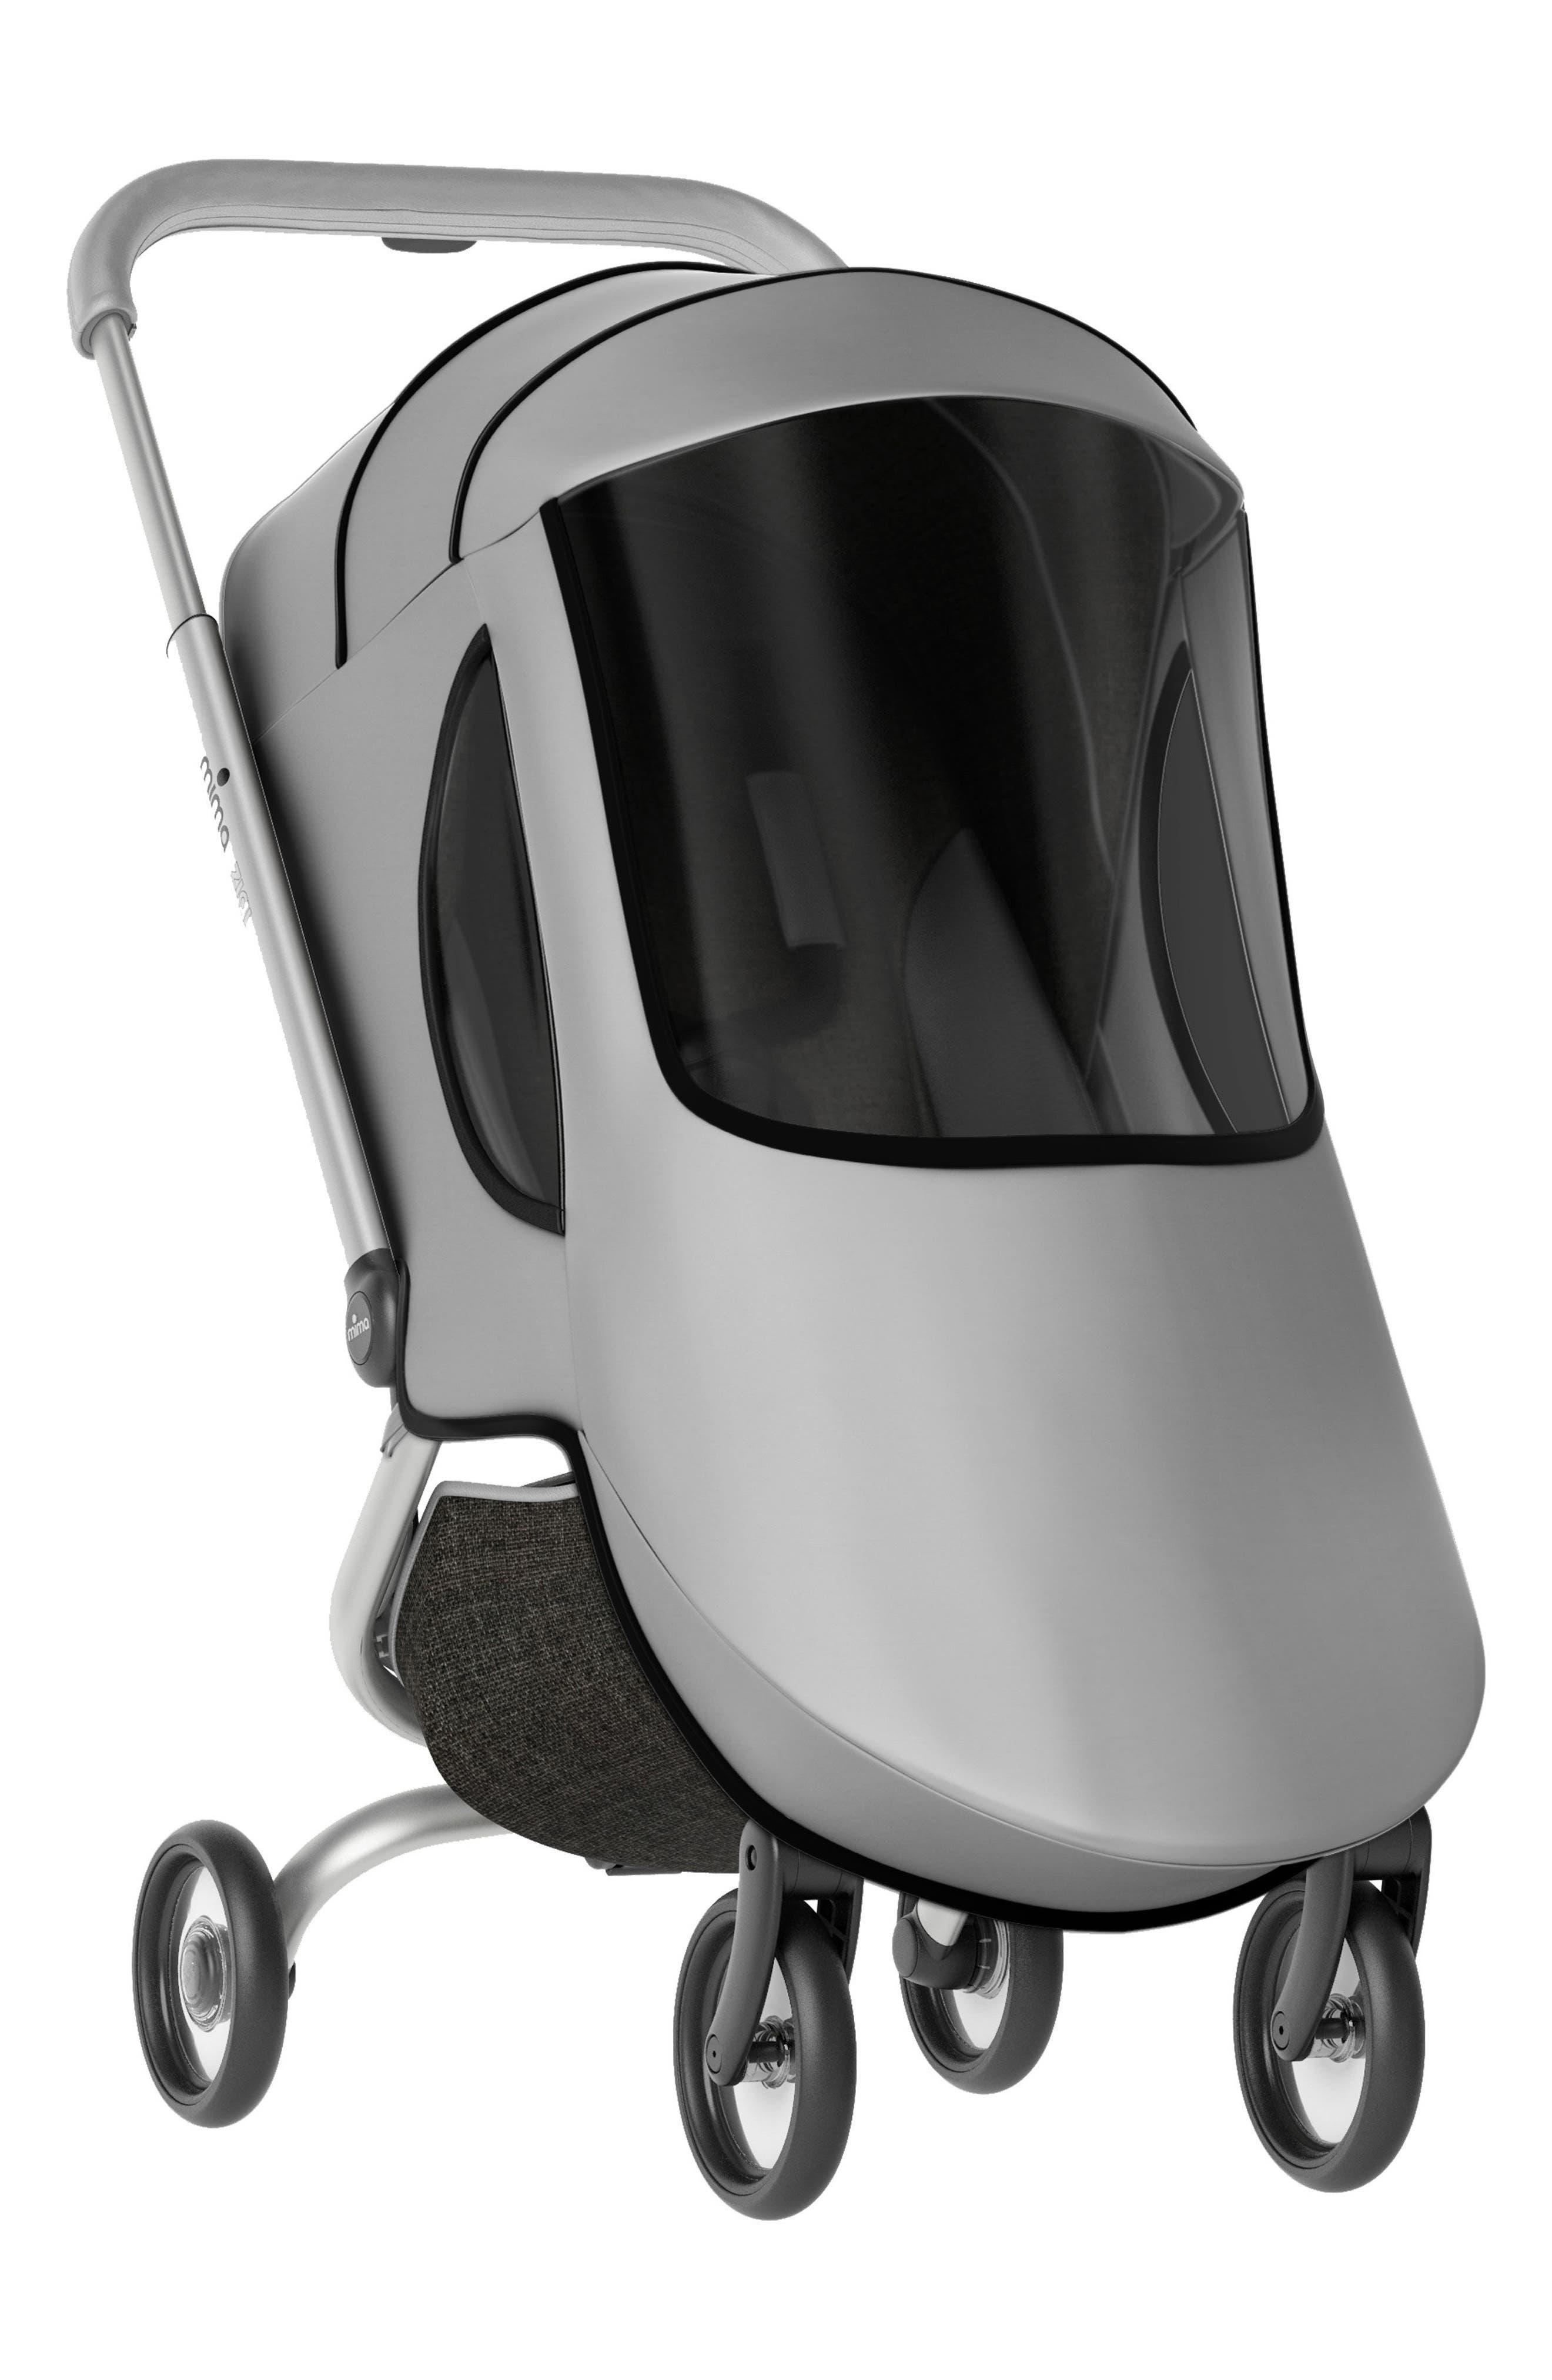 Main Image - Mima Raincover for Zigi Travel Stroller